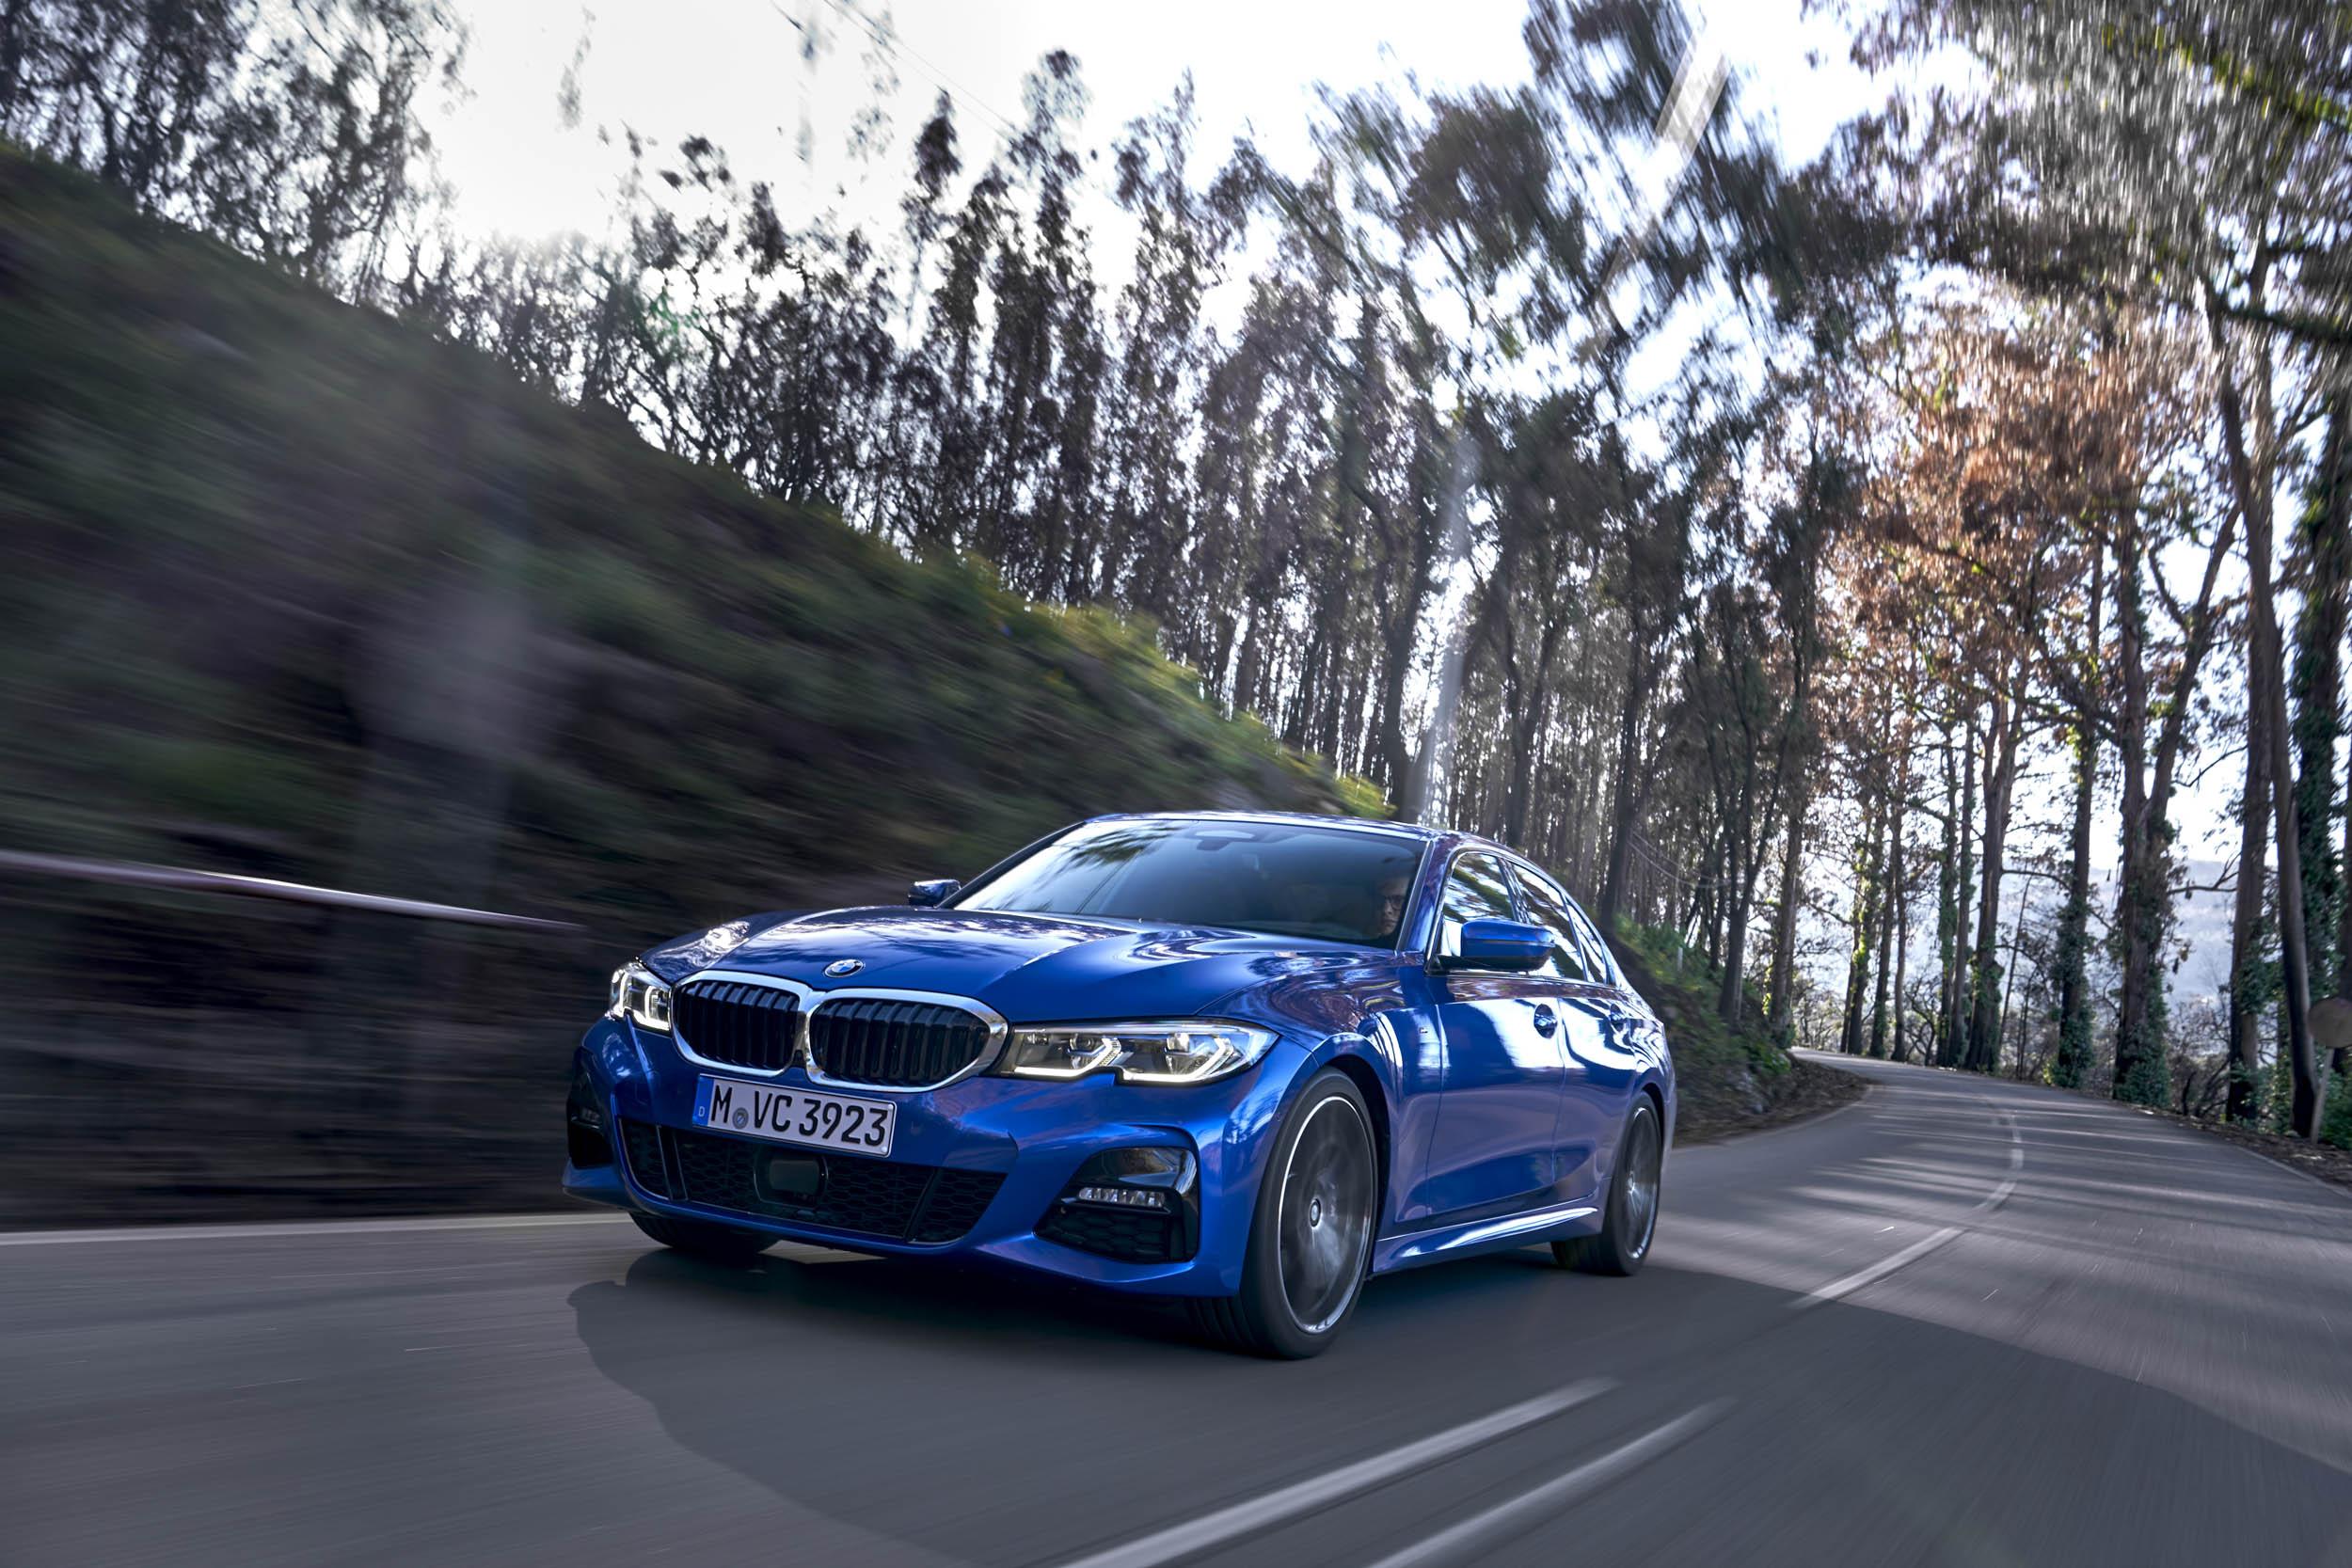 2019 BMW 330i M Sport driving